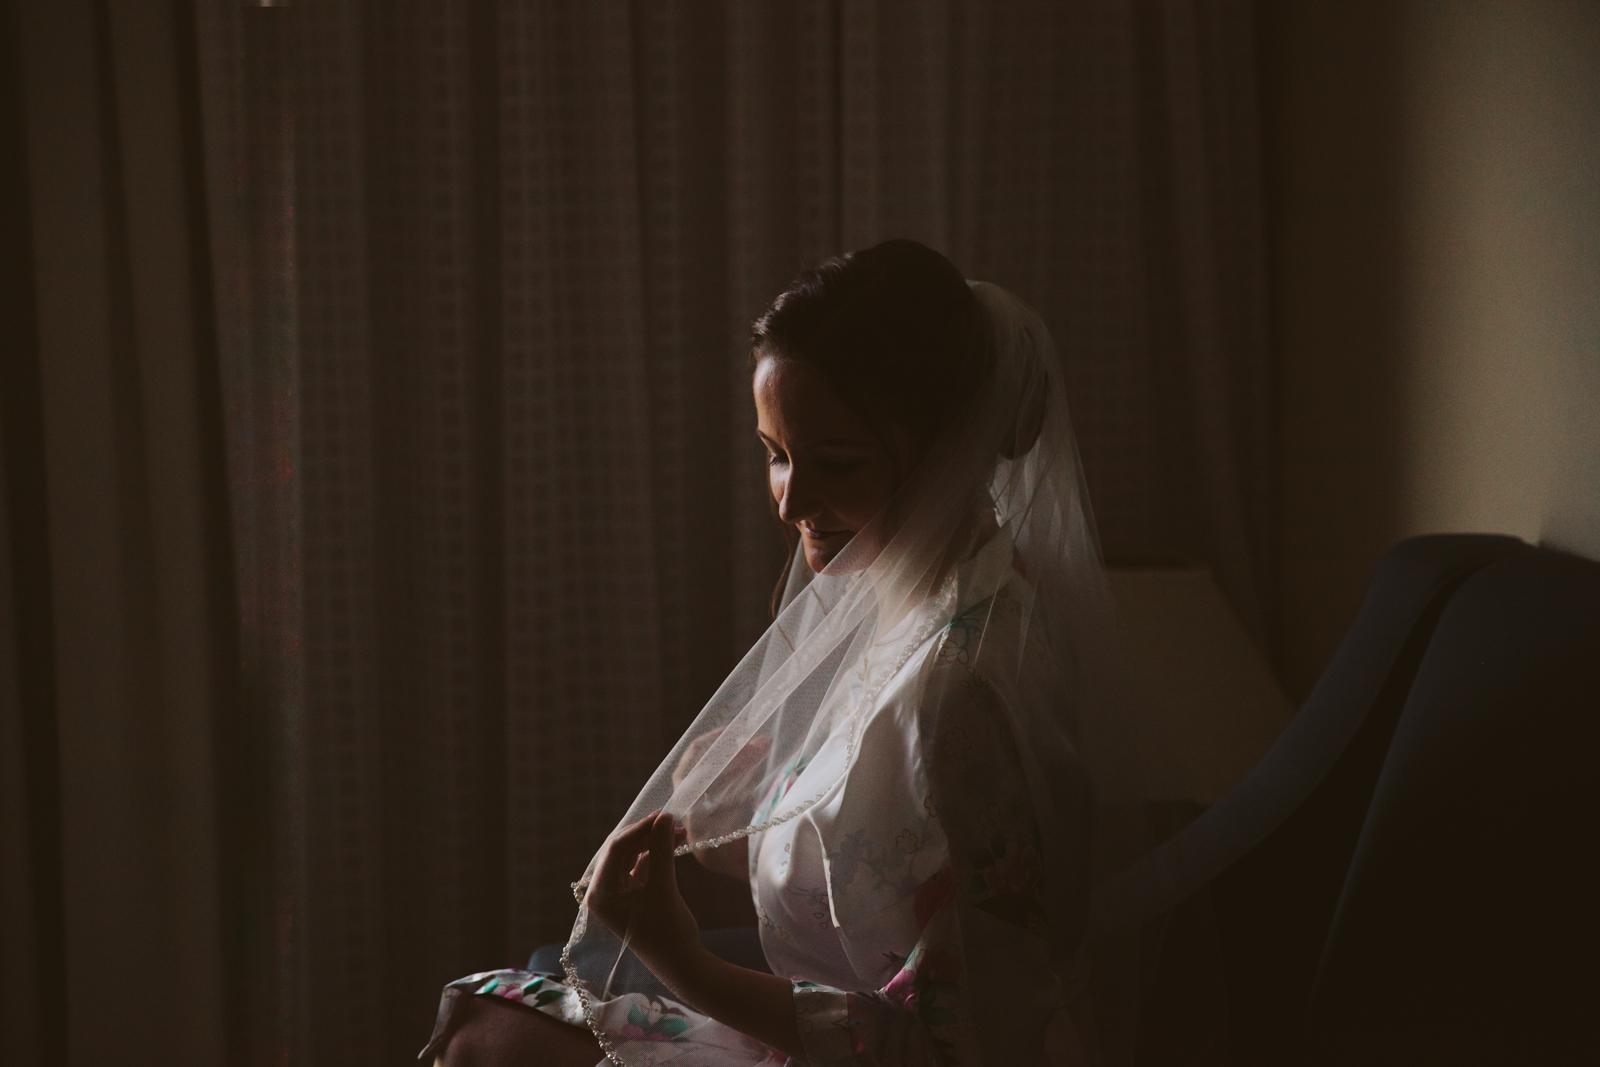 Eastons-Beach-Rotunda-Ballroom-Wedding-Newport-Rhode-Island-PhotographybyAmandaMorgan-19.jpg